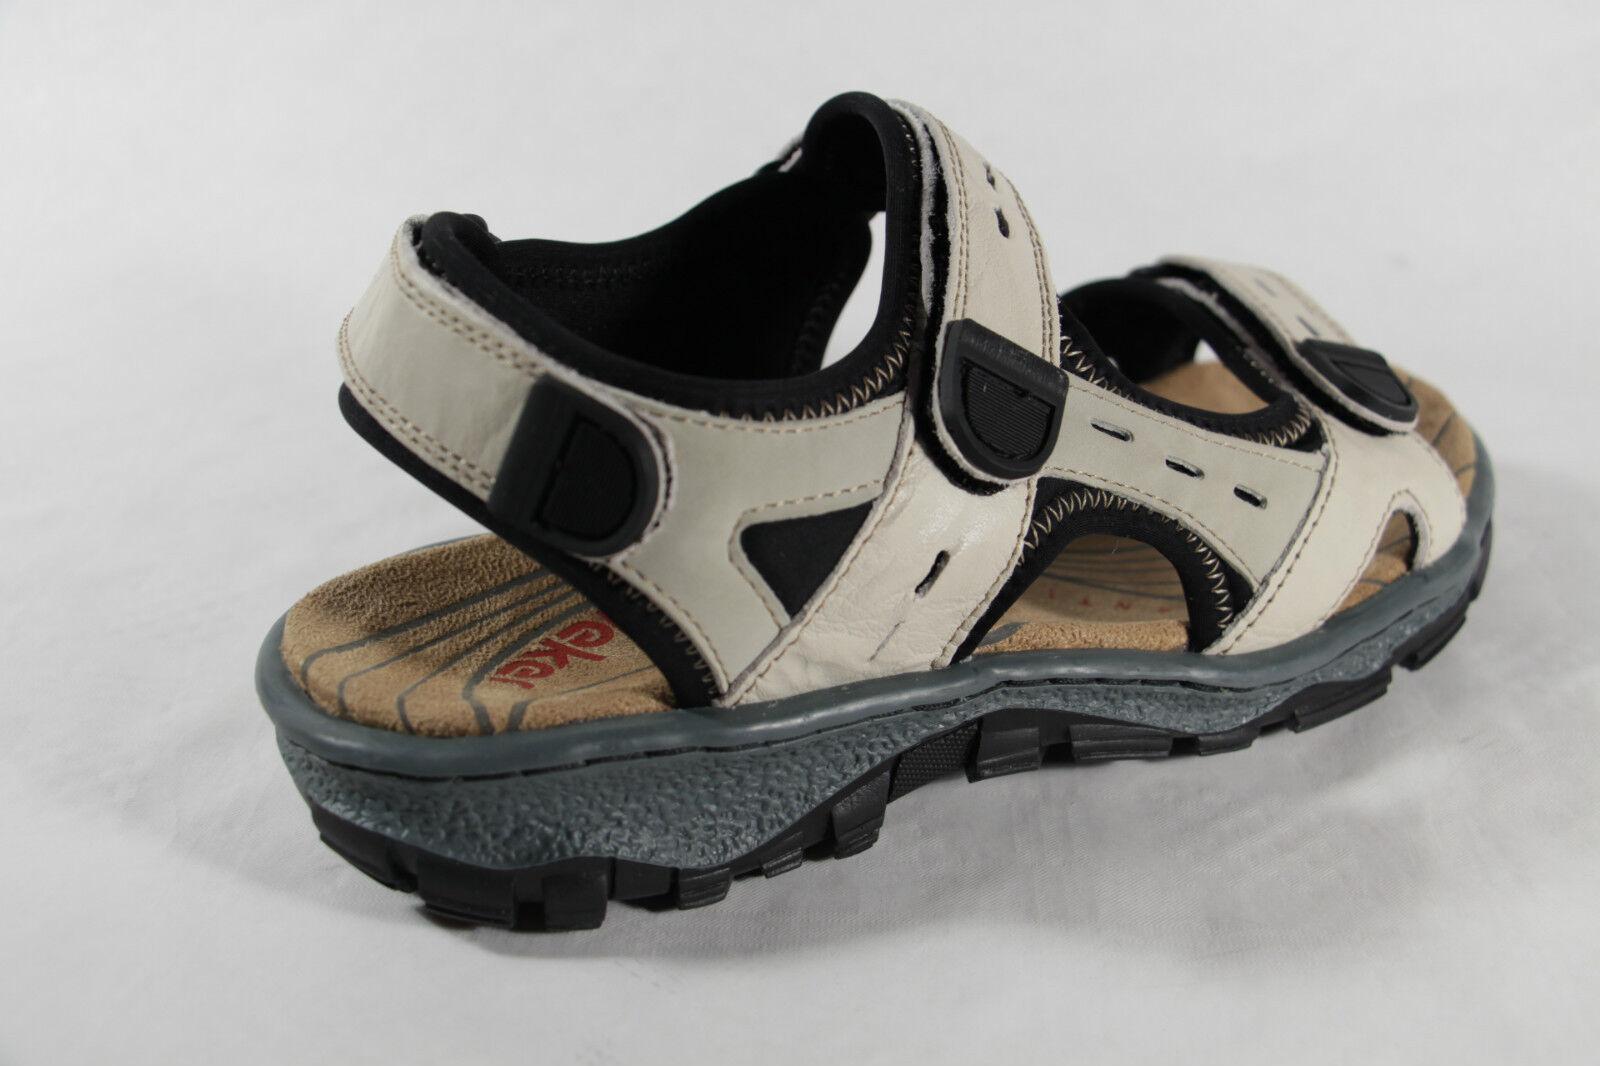 Rieker Damen Damen Damen Sandale, beige, Klettverschluß, weiche Innensohle, Gummisohle NEU   e90c63